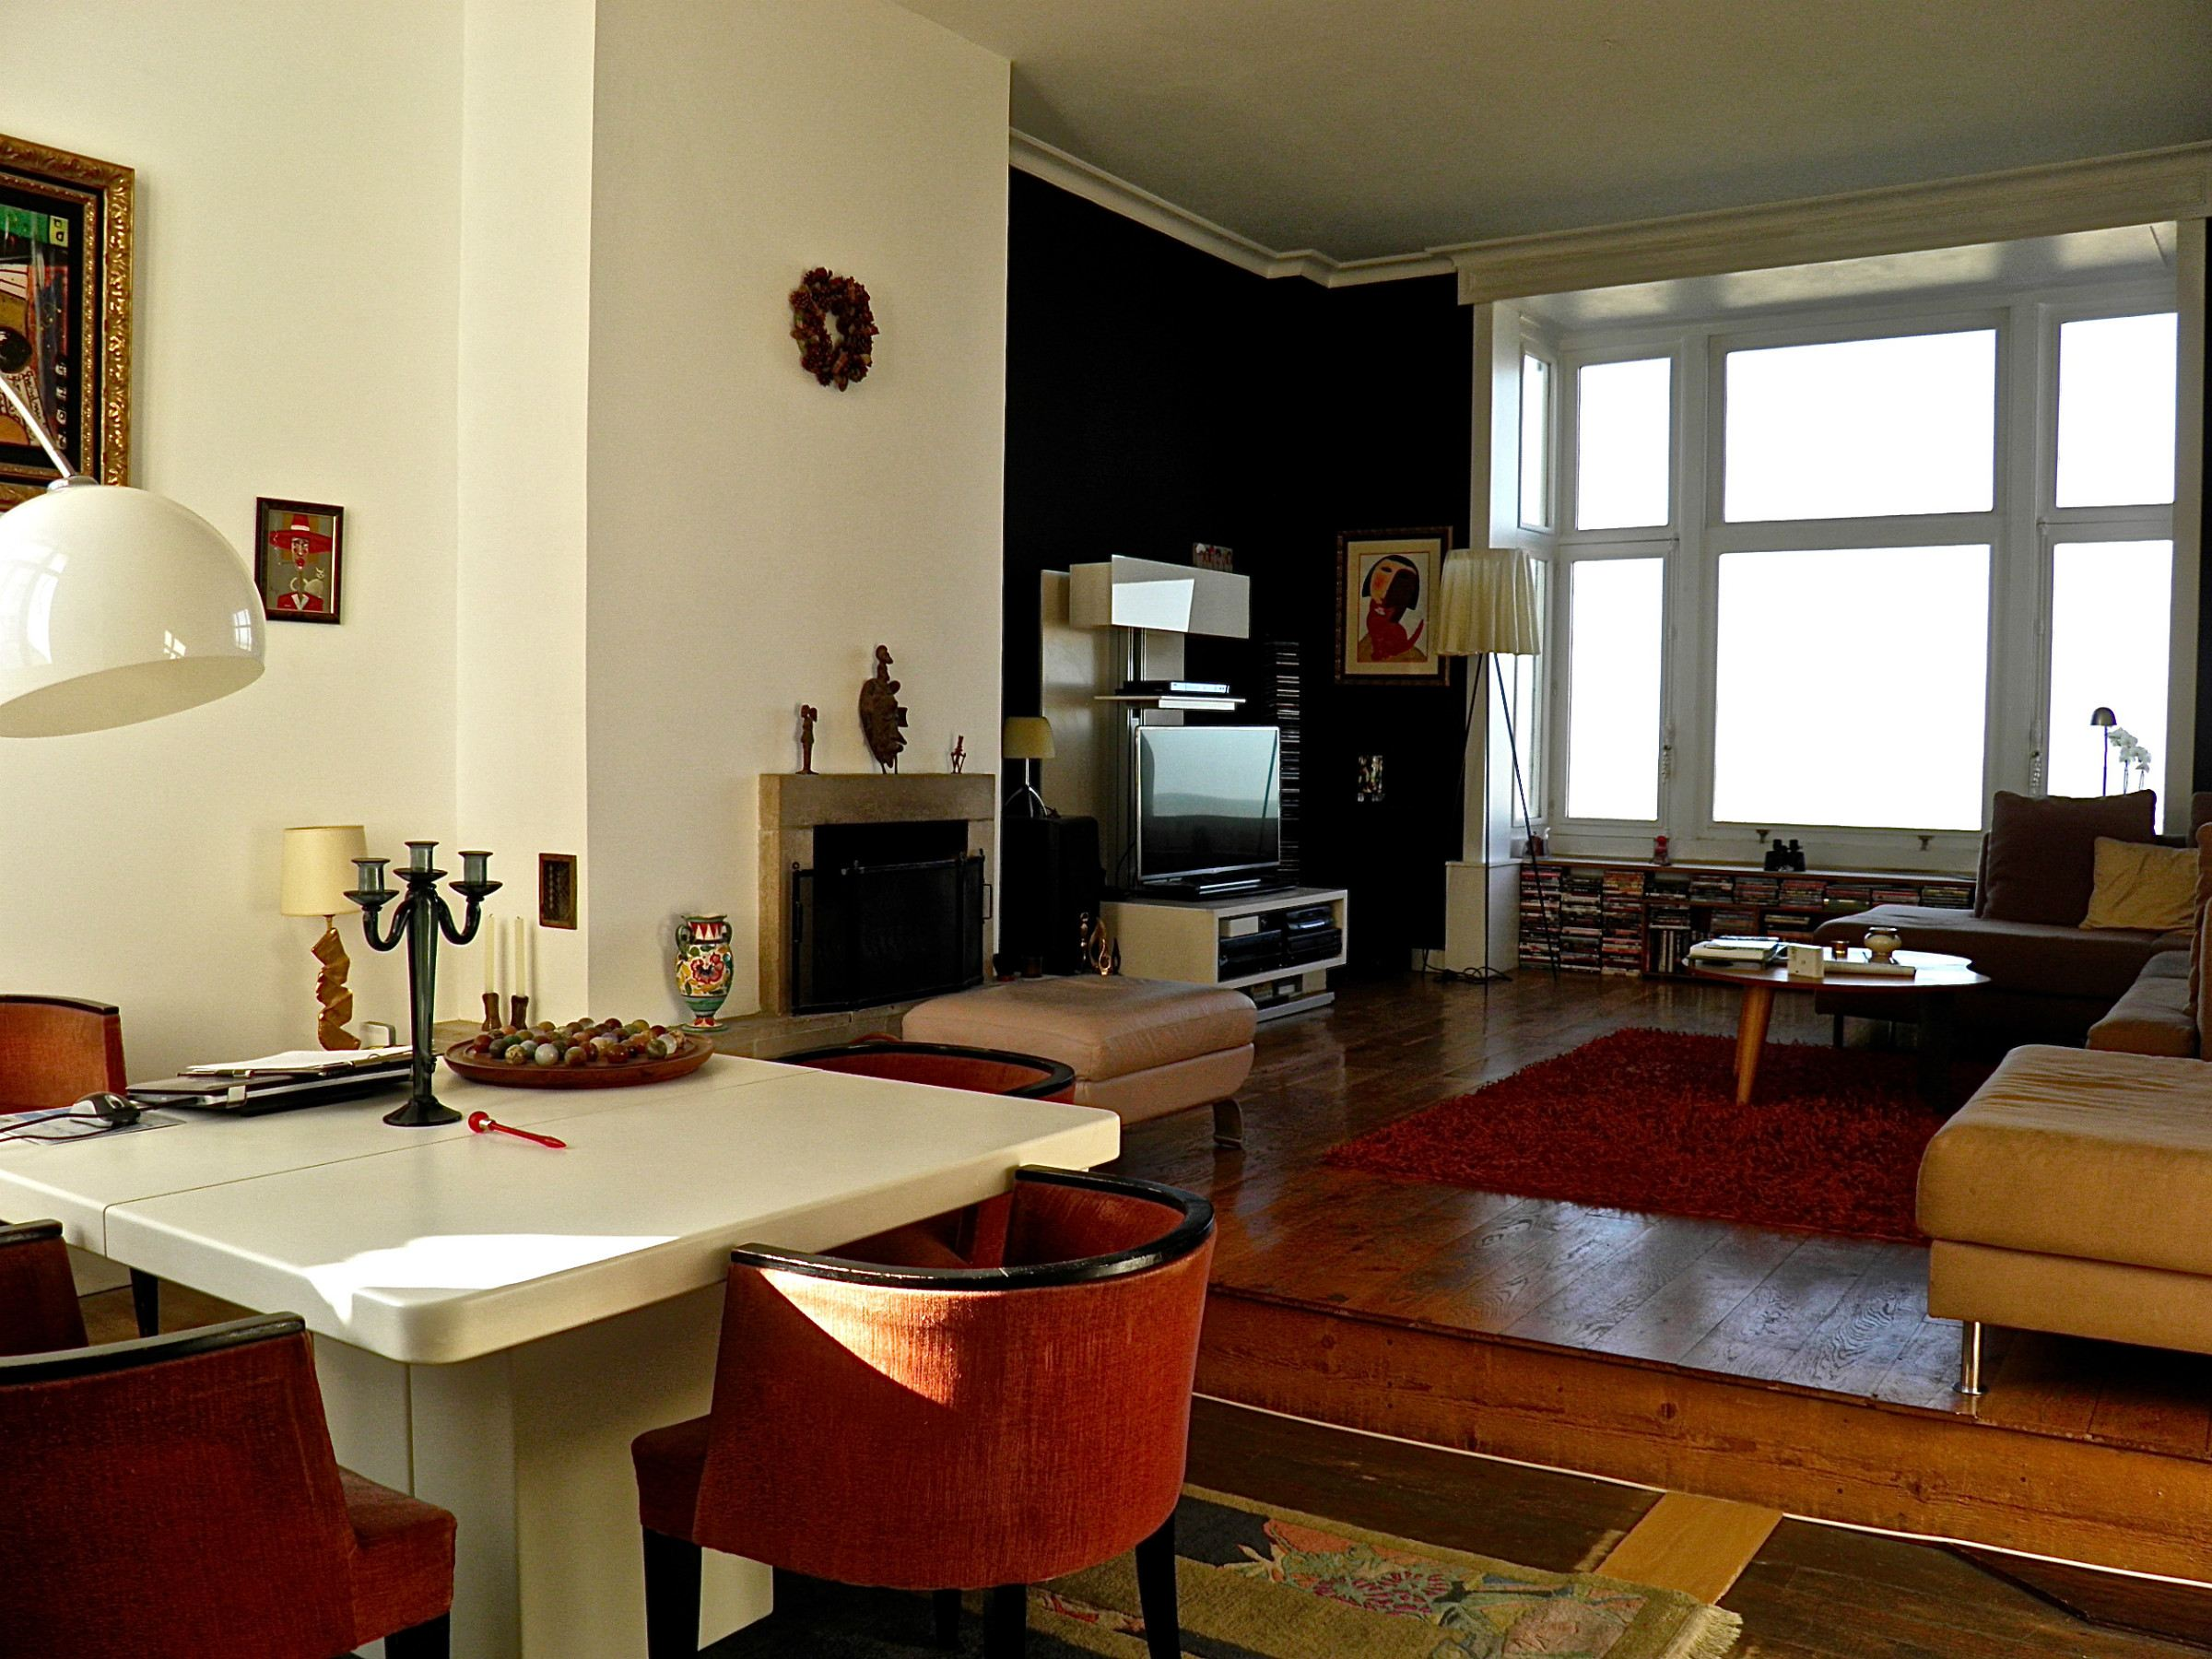 sales property at BRAY DUNES, Sea View, Villa 211 m2 Hab. 4 bedrooms